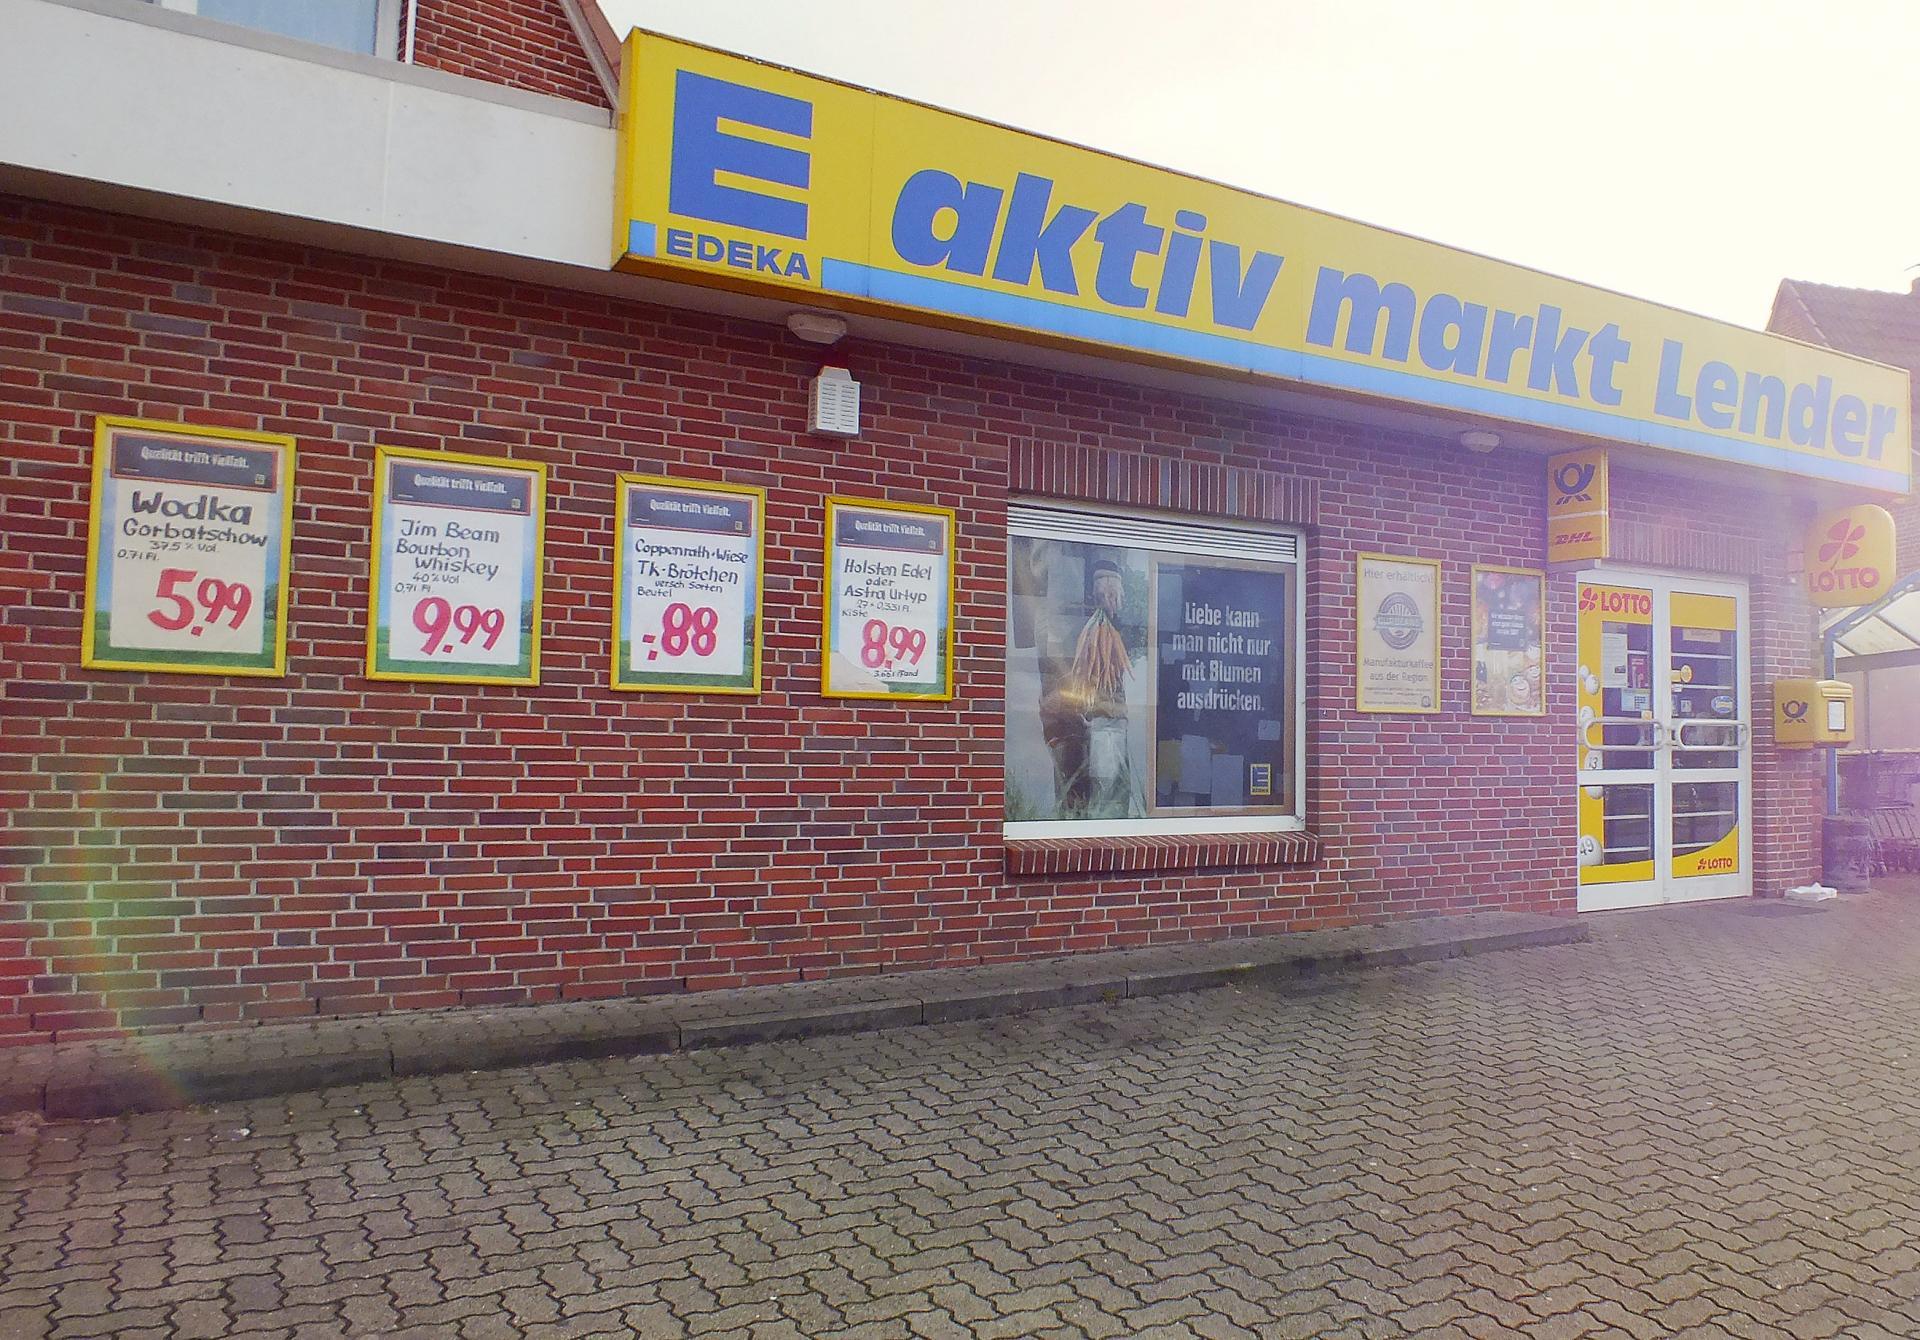 Edeka aktiv markt Lender